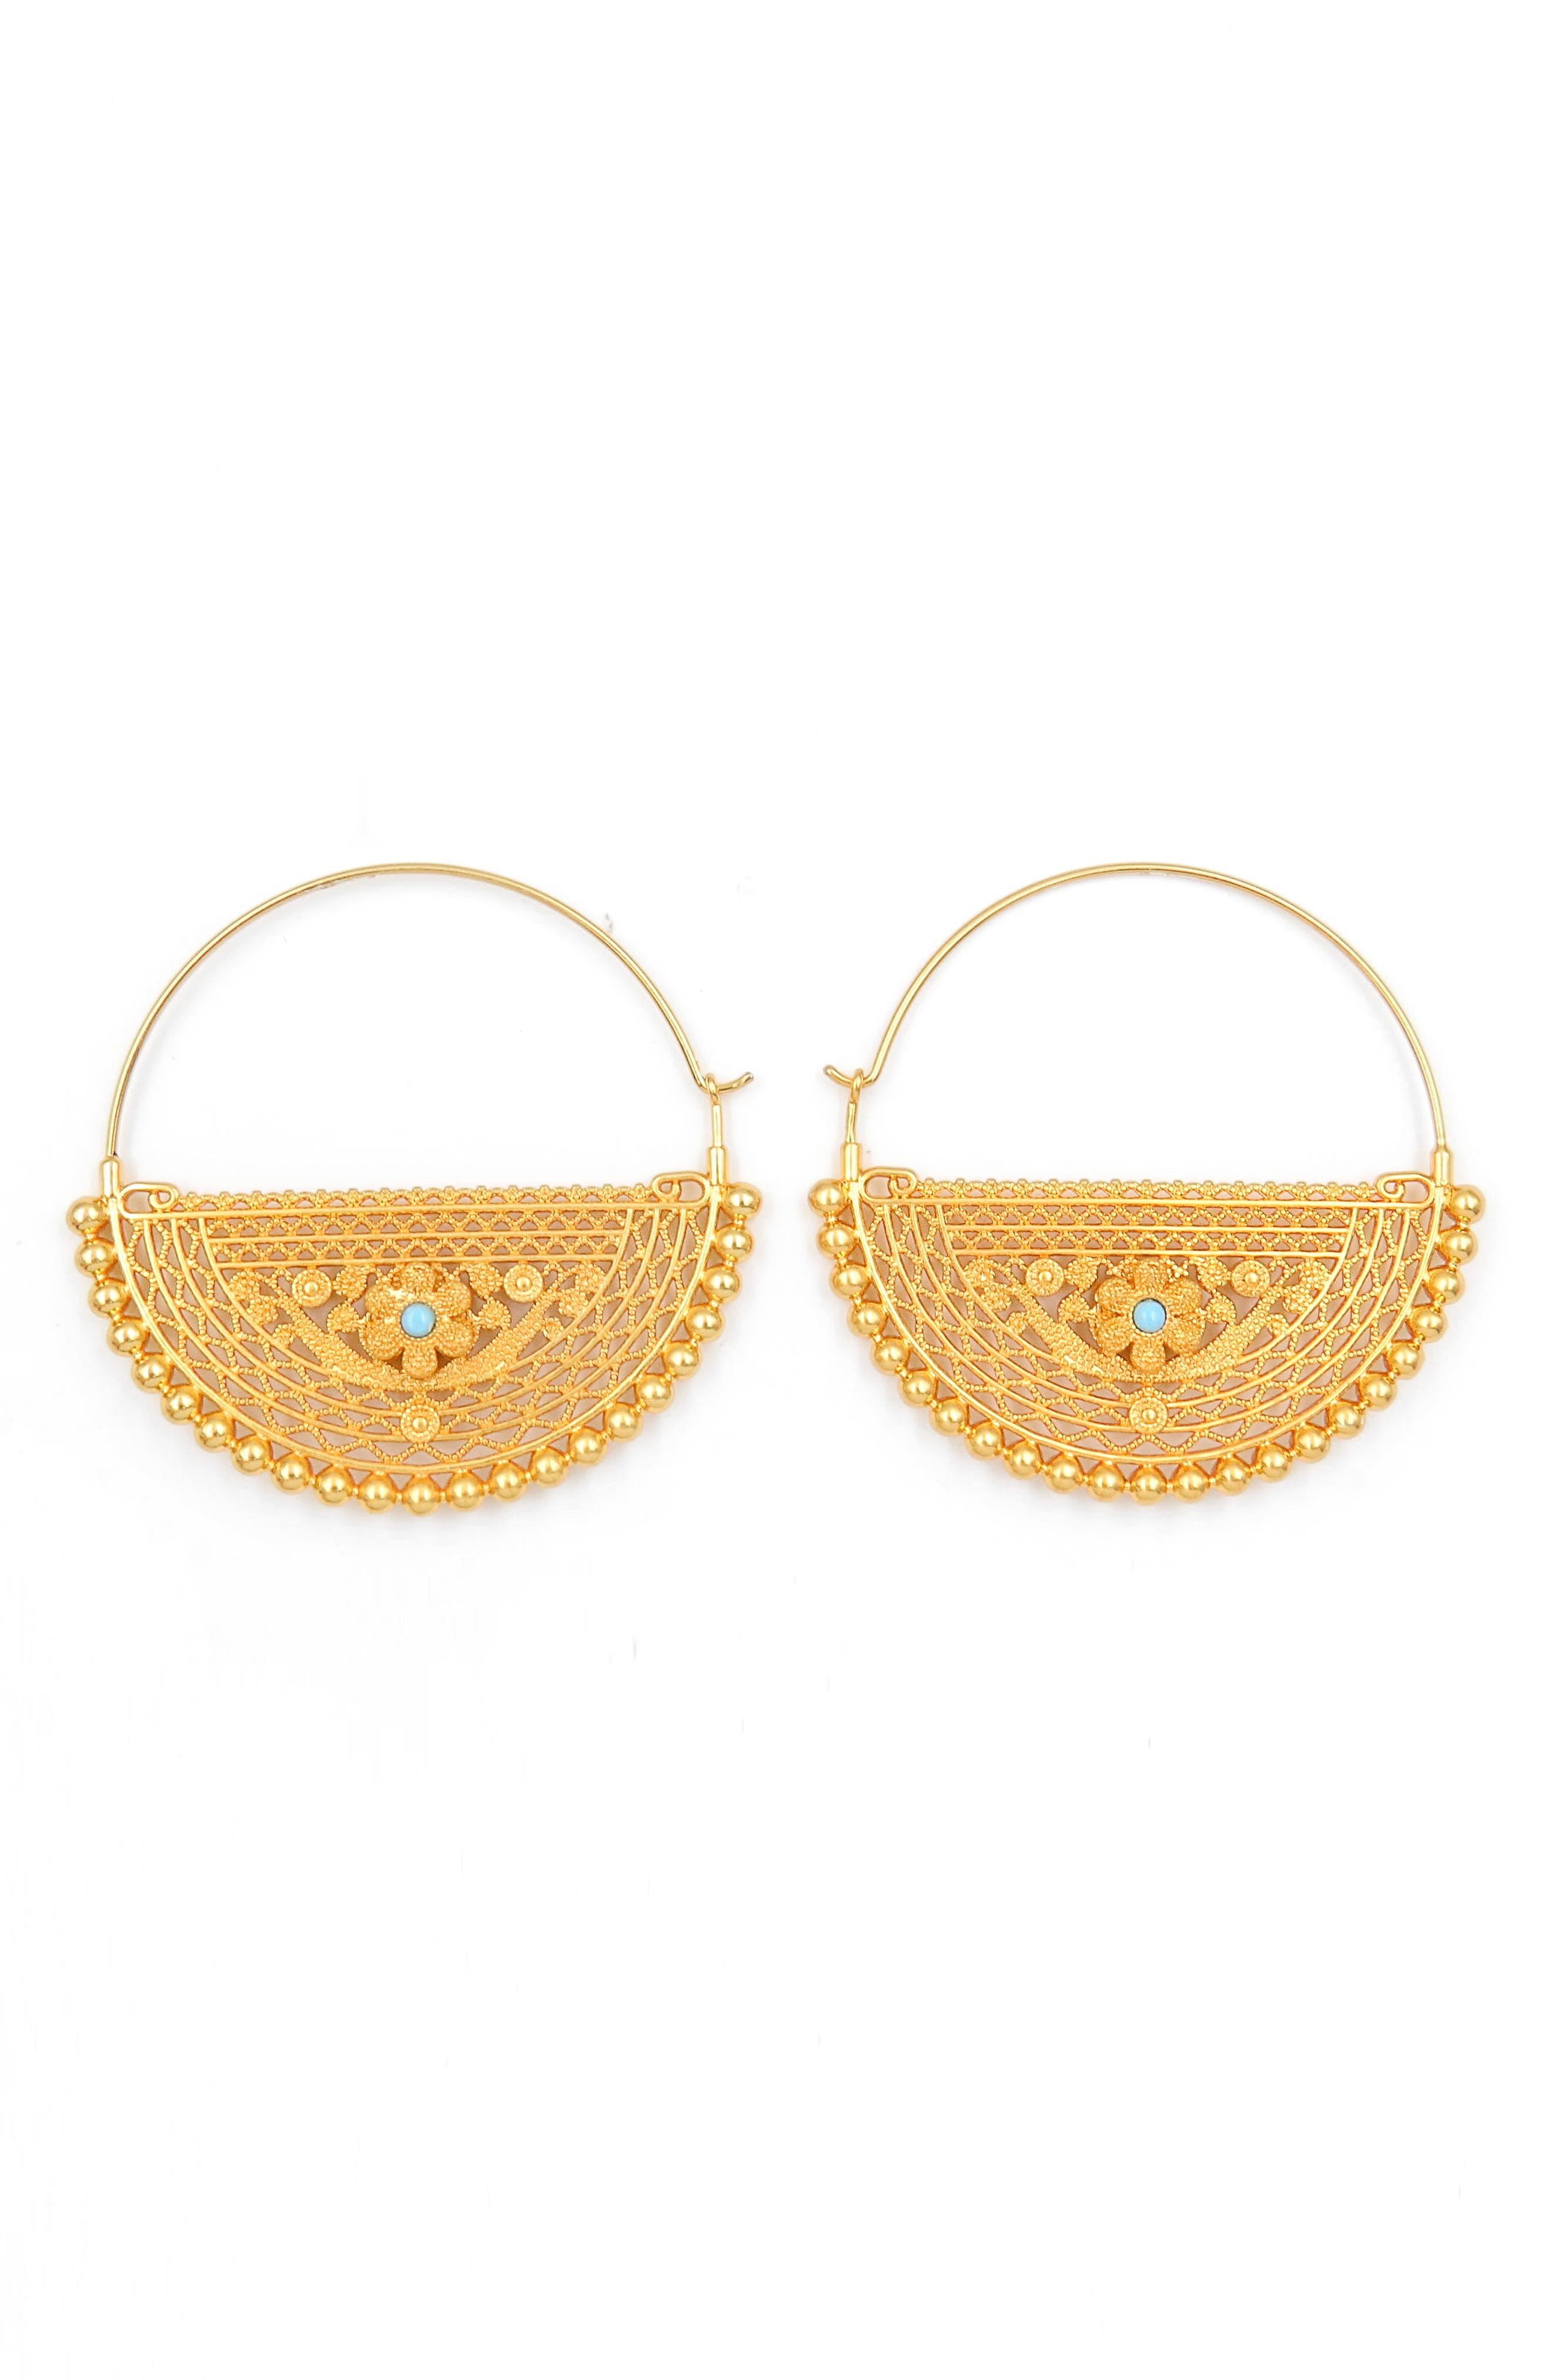 Asa Kaftans Filigree Hoop Earrings